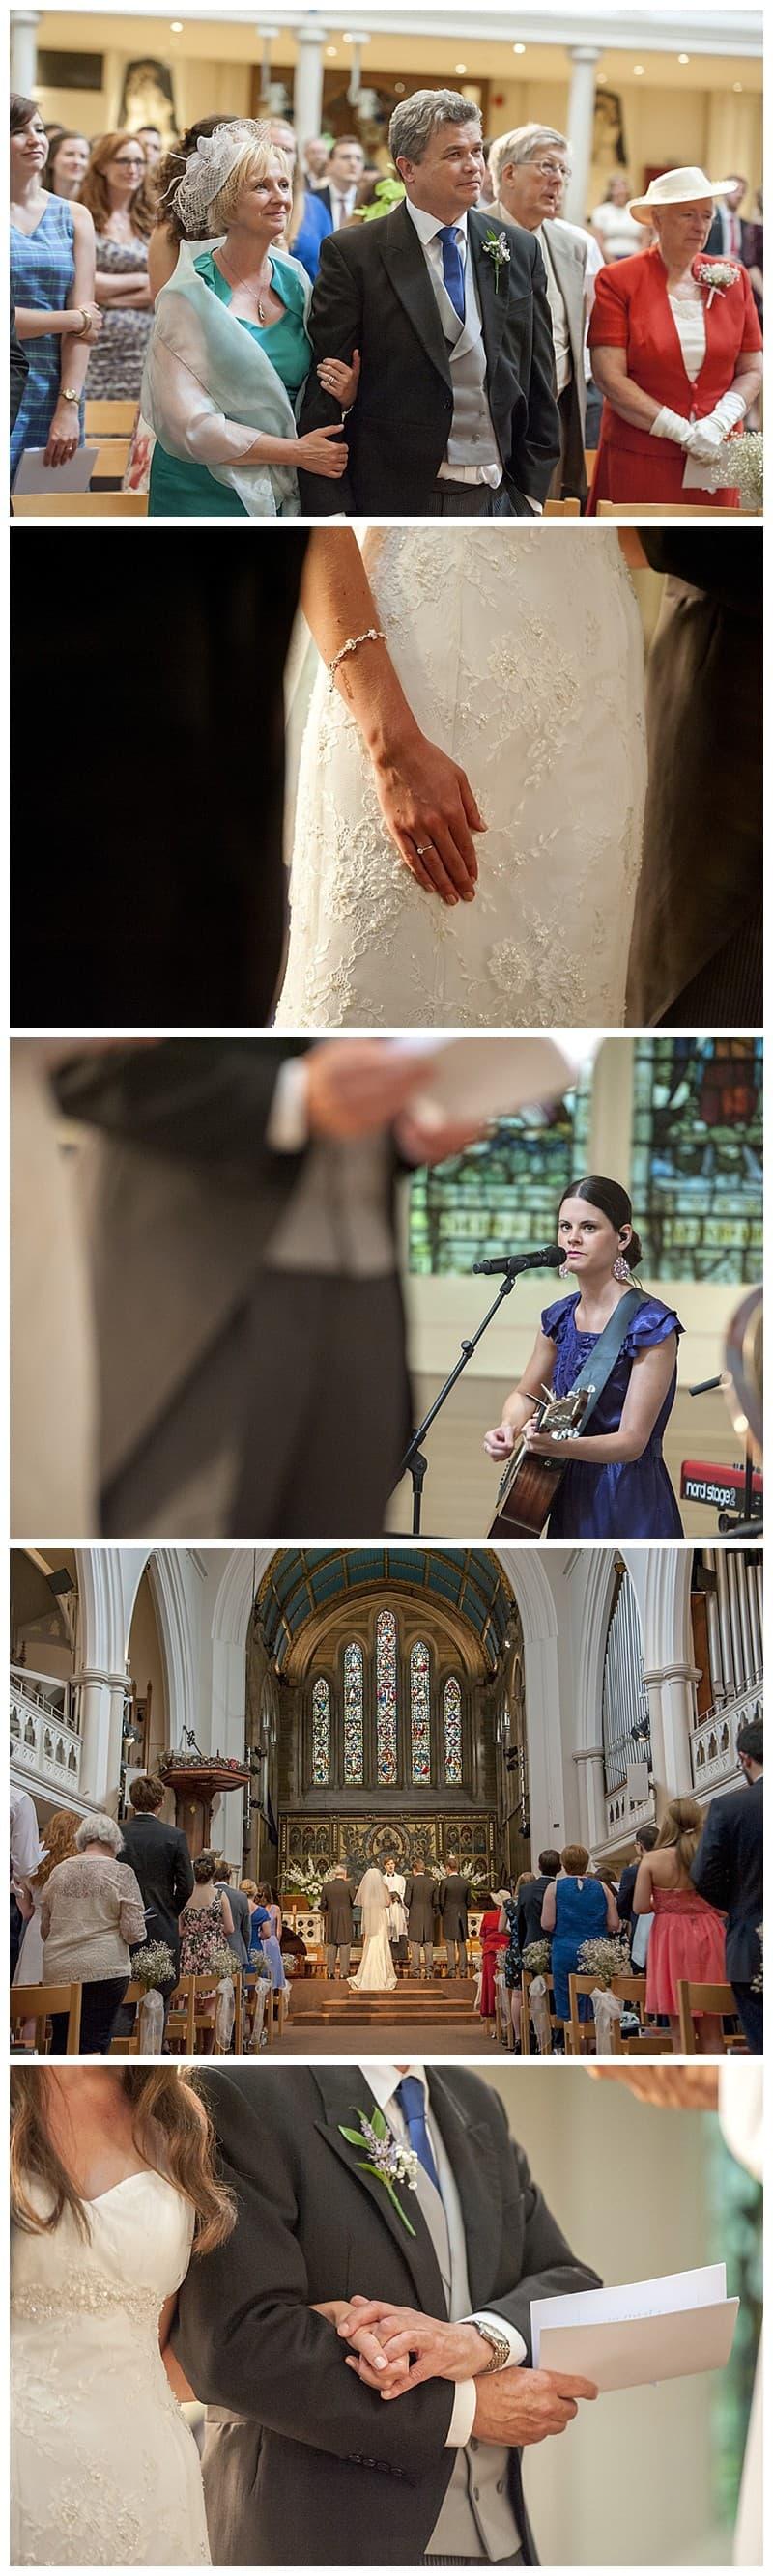 Dan & Rachel, Hyde Park, Kensington Wedding, Benjamin Wetherall Photography0012